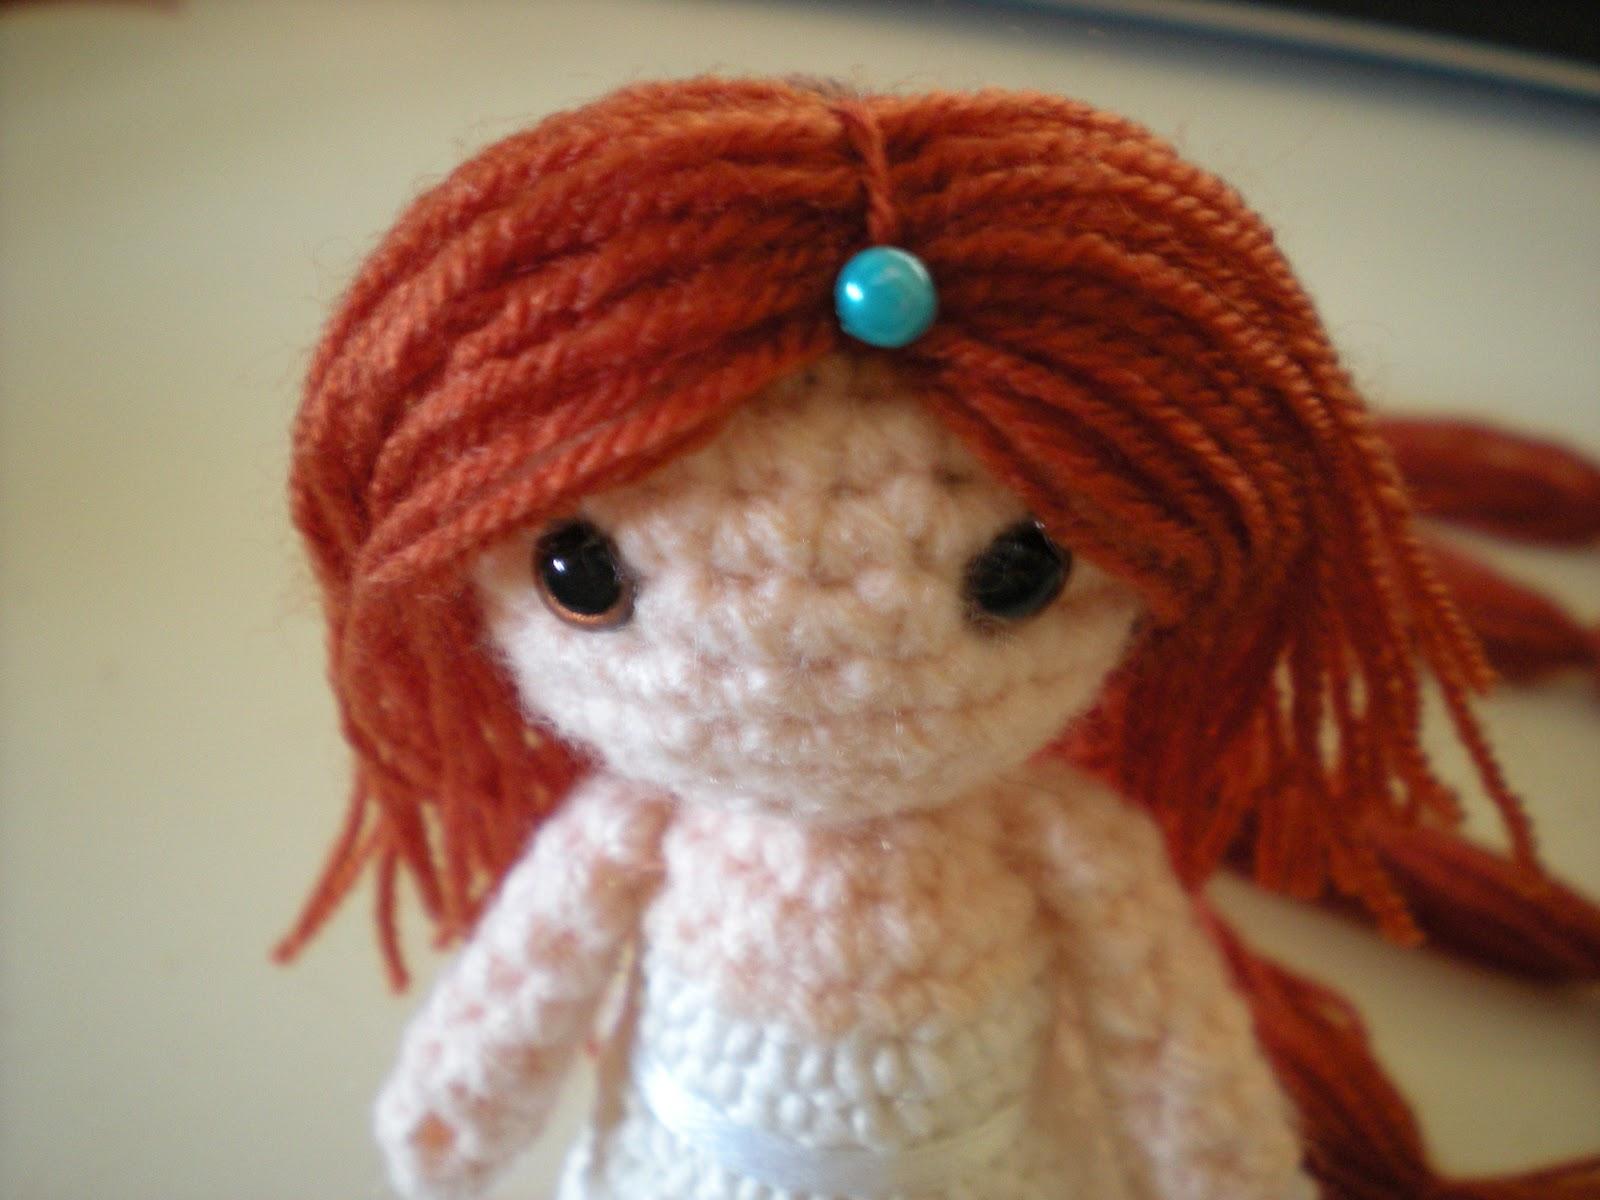 Amigurumi Hair Tutorial : Geekurumi: tutorial: how to make and attach hair to your amigurumi dolls